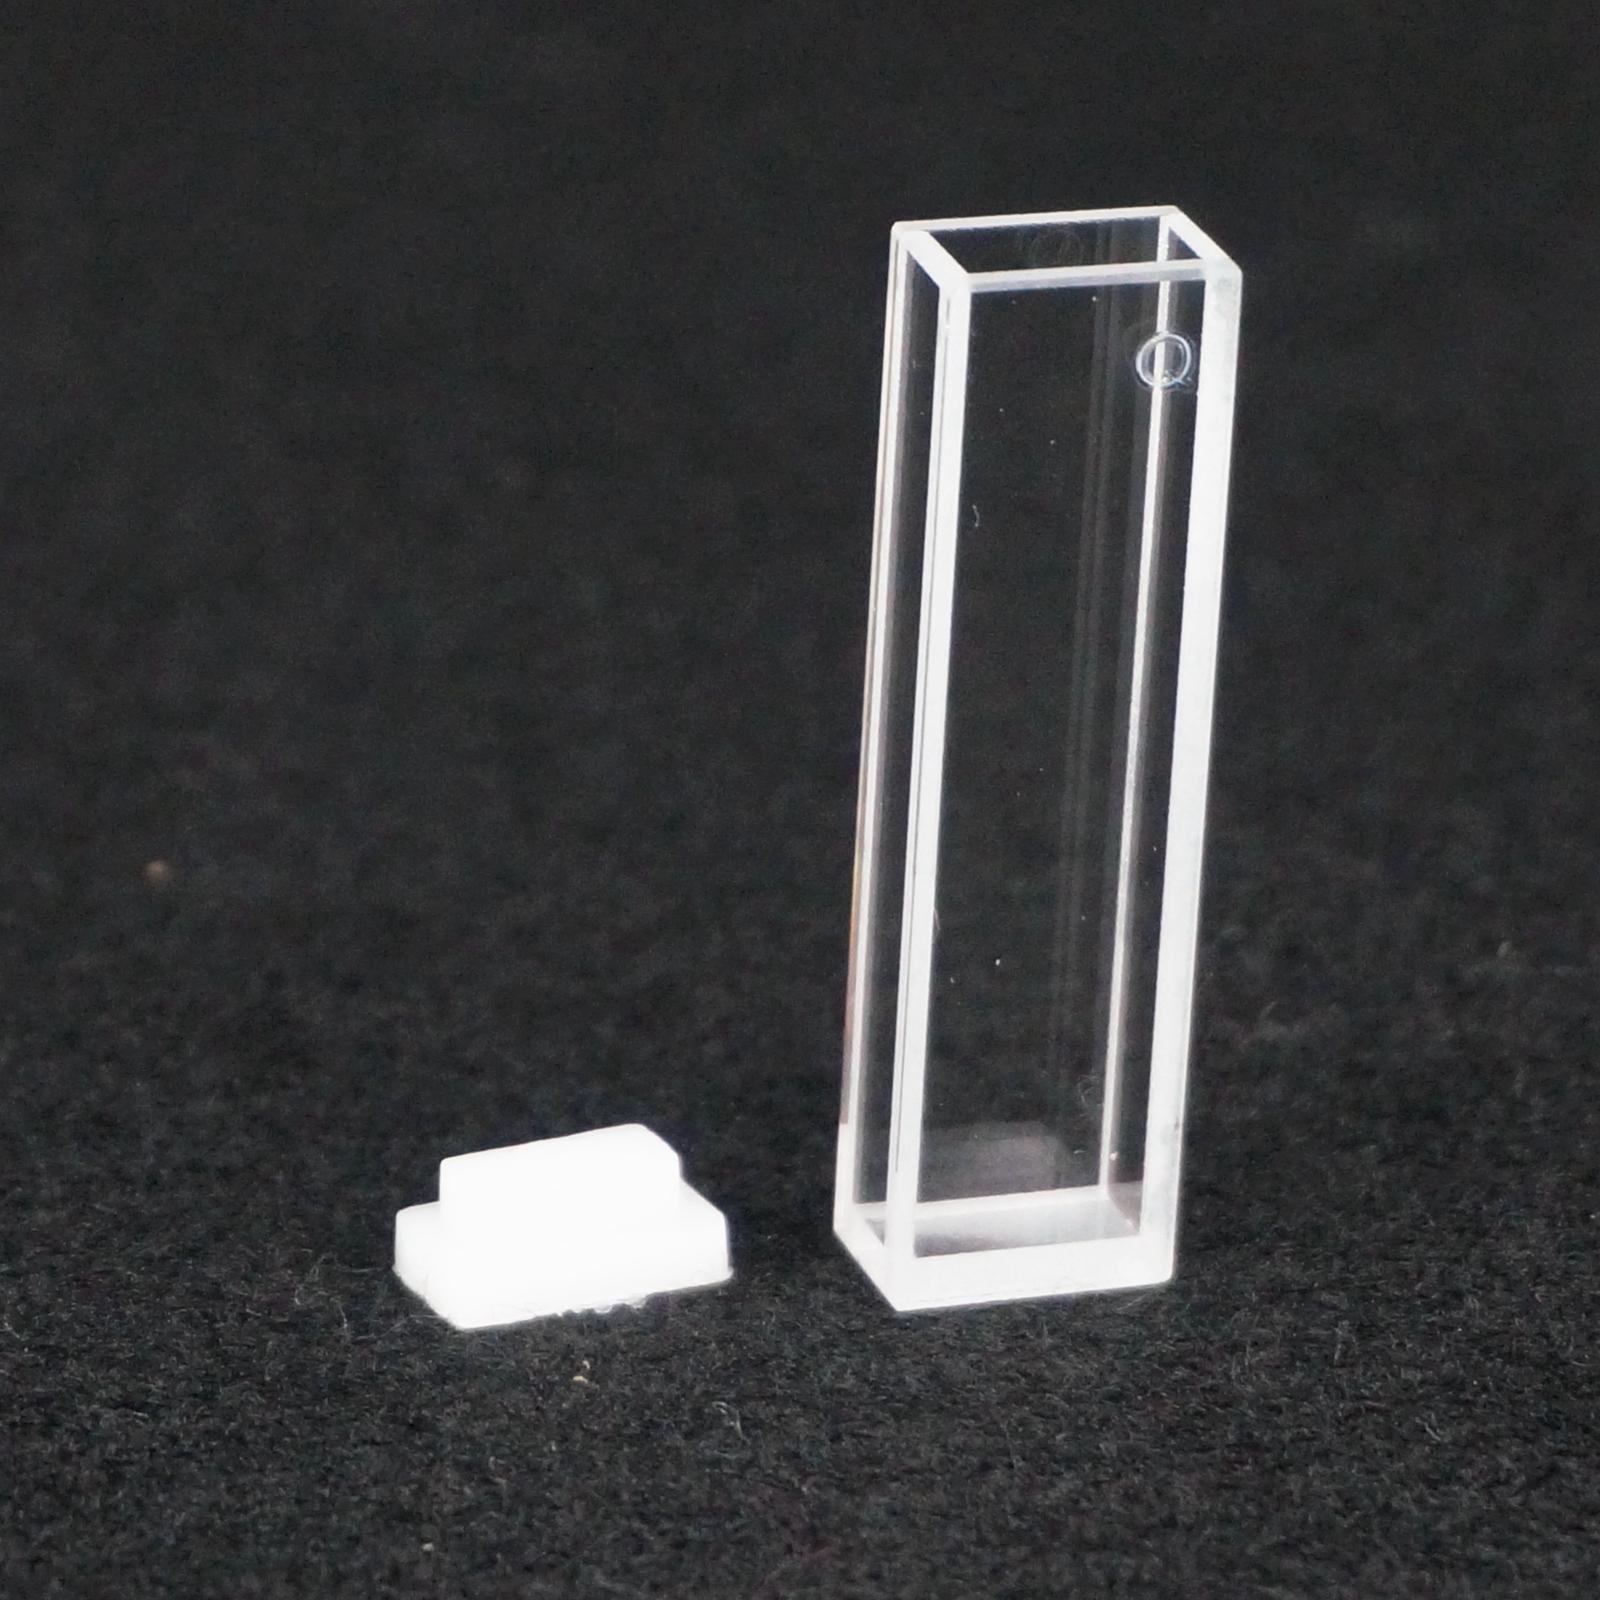 5mm x 10mm Path Length JGS1 Quartz Cuvette Cell With Telfon Lid For Fluorescence Spectrometer 1pcs 5mm path length jgs1 quartz cuvette cell with with screw cap for spectrometer 4 widows